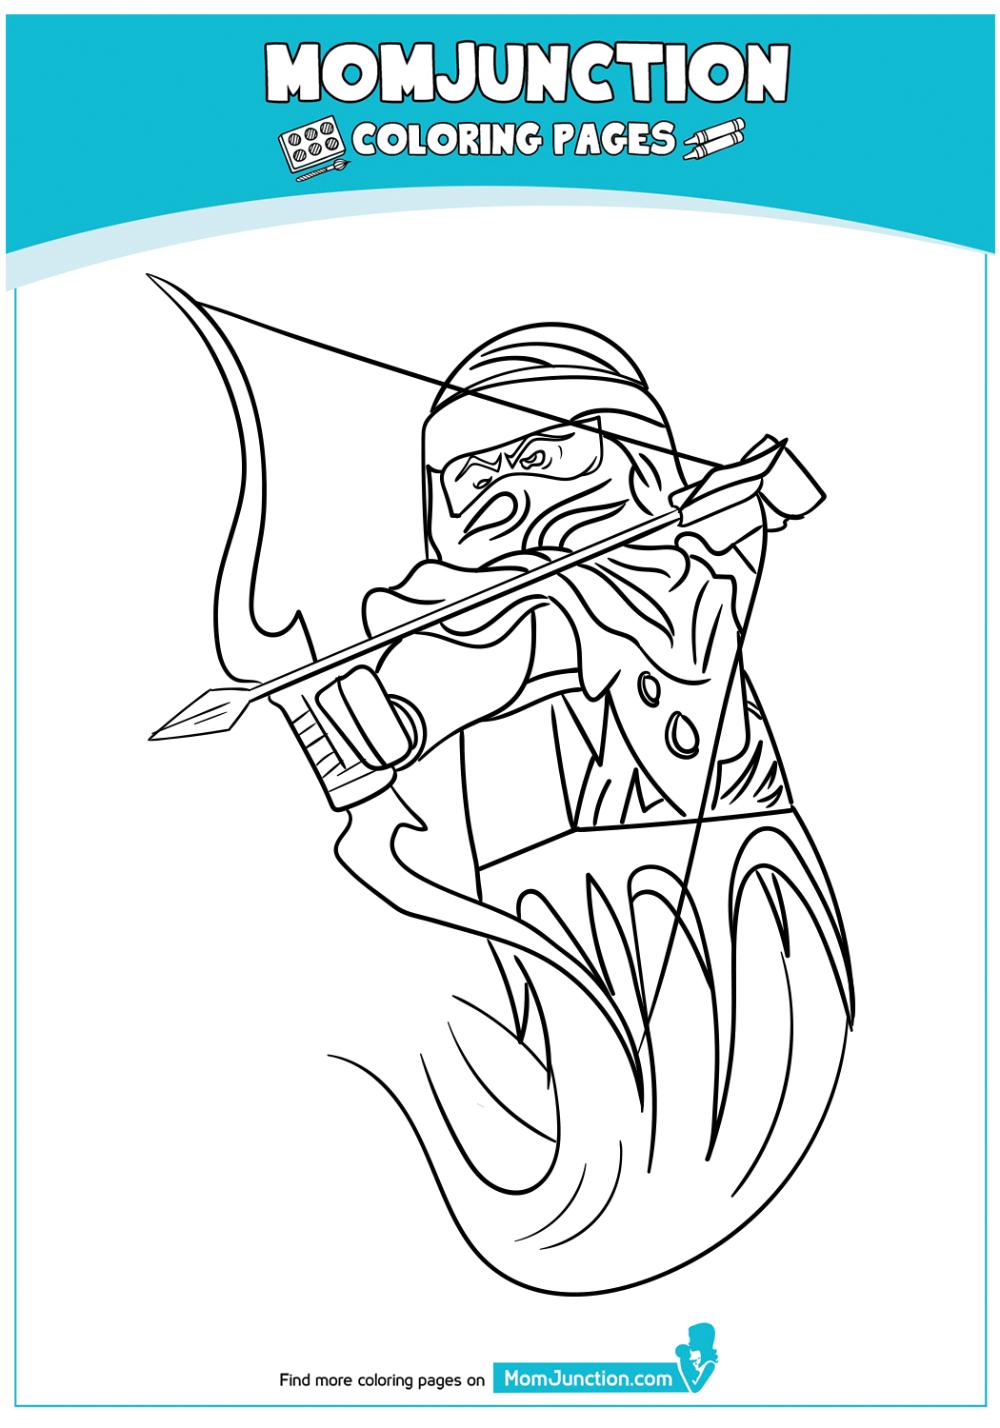 Ninjago Kai Into Action Coloring Page In 2021 Coloring Pages Ninjago Coloring Pages Color [ 1428 x 1000 Pixel ]